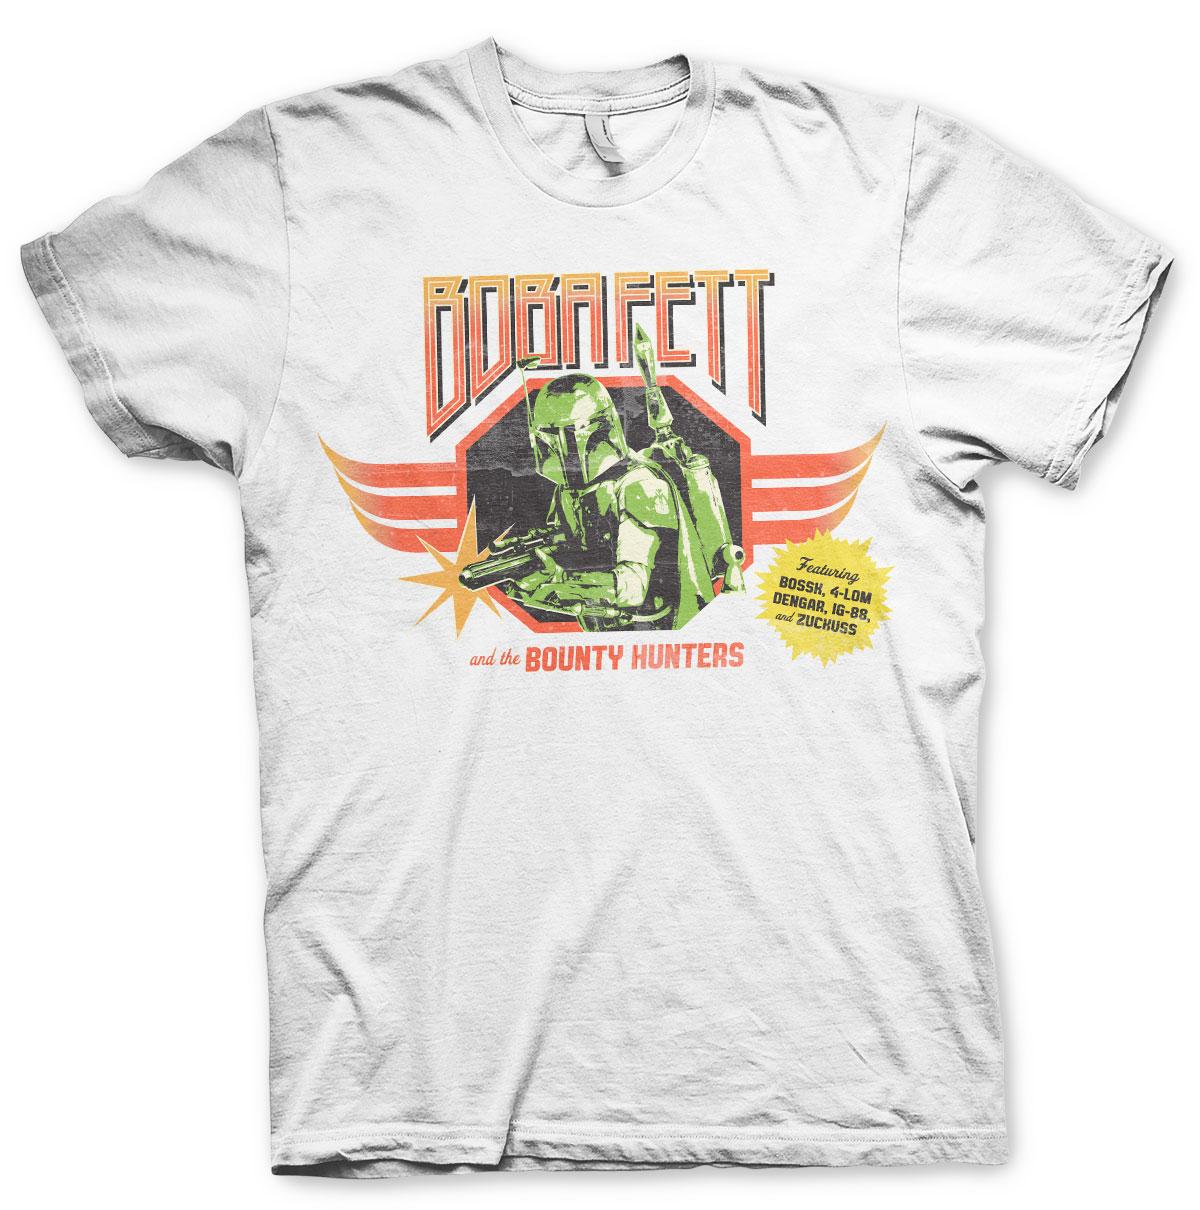 Boba Fett And The Bounty Hunters T-Shirt